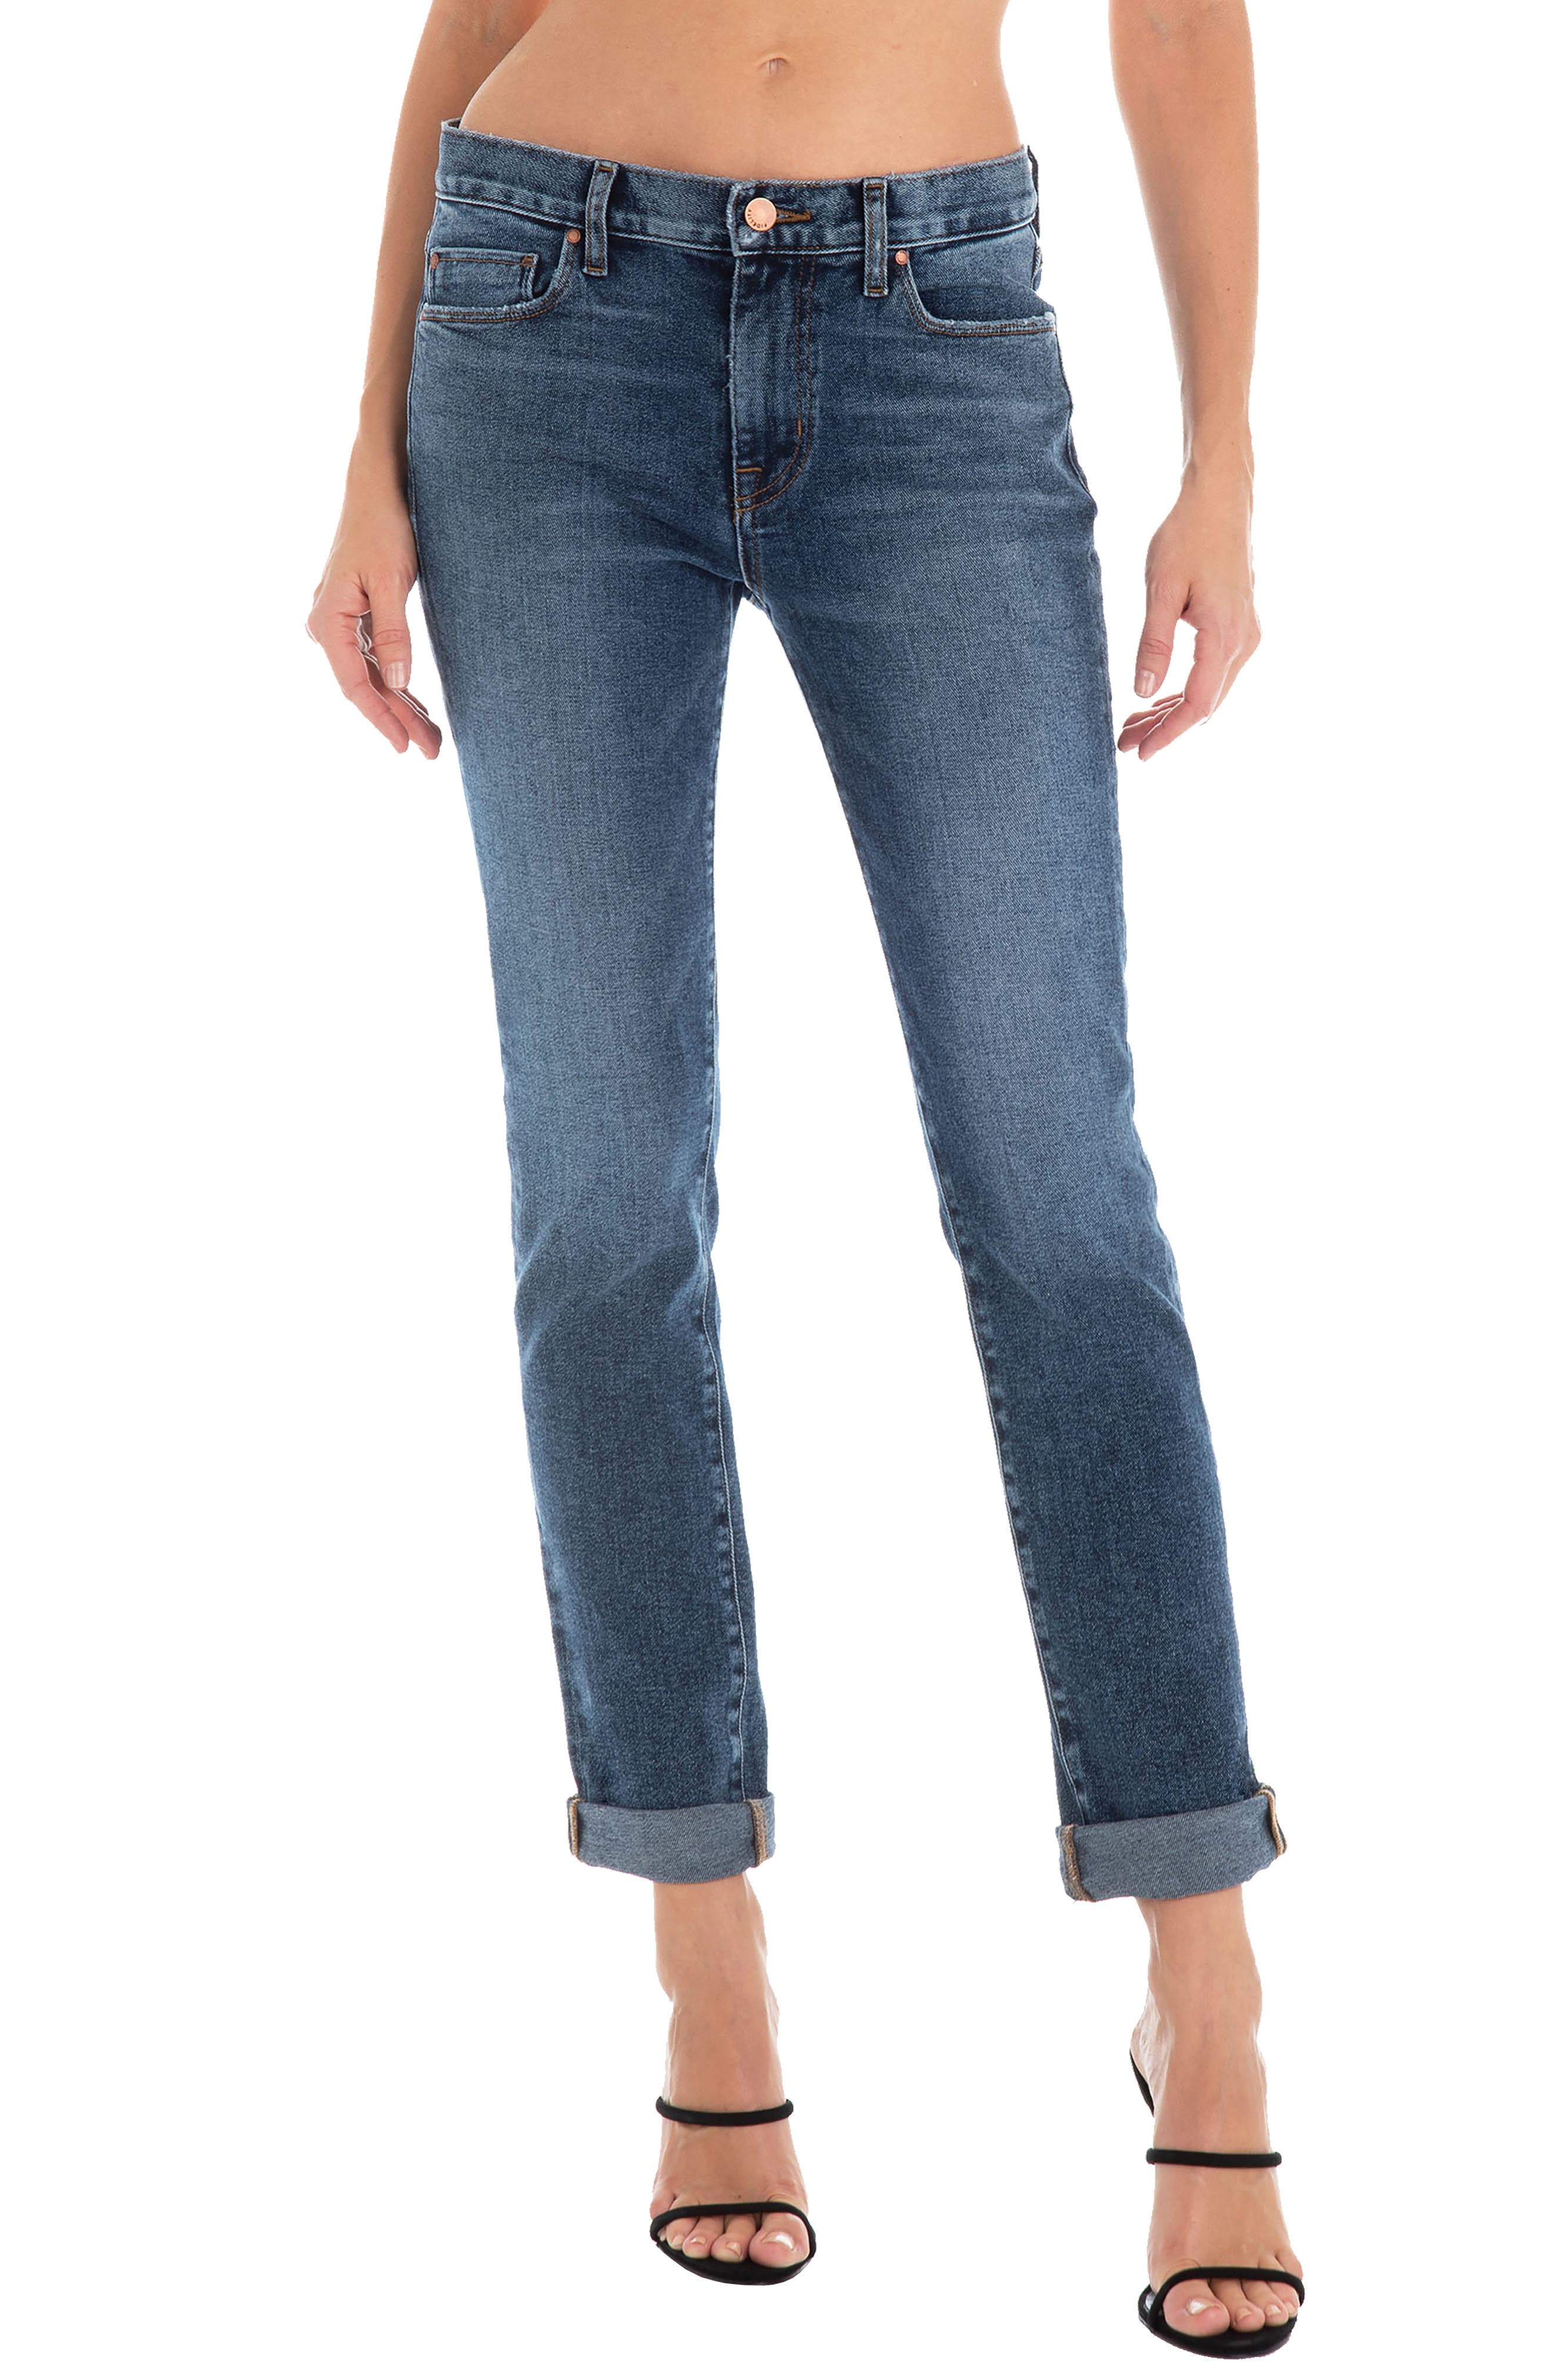 Fidelity Denim Oh Boy High Waist Boyfriend Jeans (All Star)